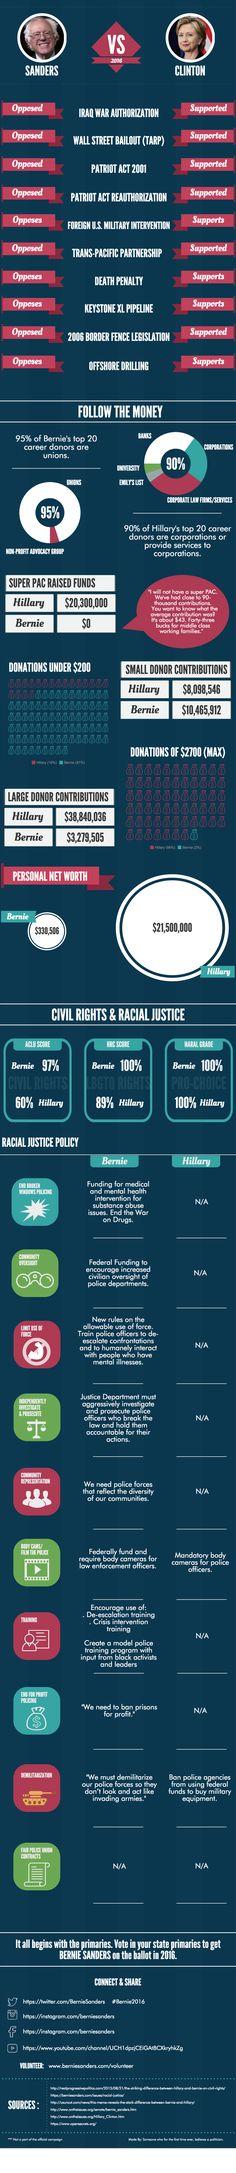 another great updated Bernie vs Hillary info graphic - Democratic Underground